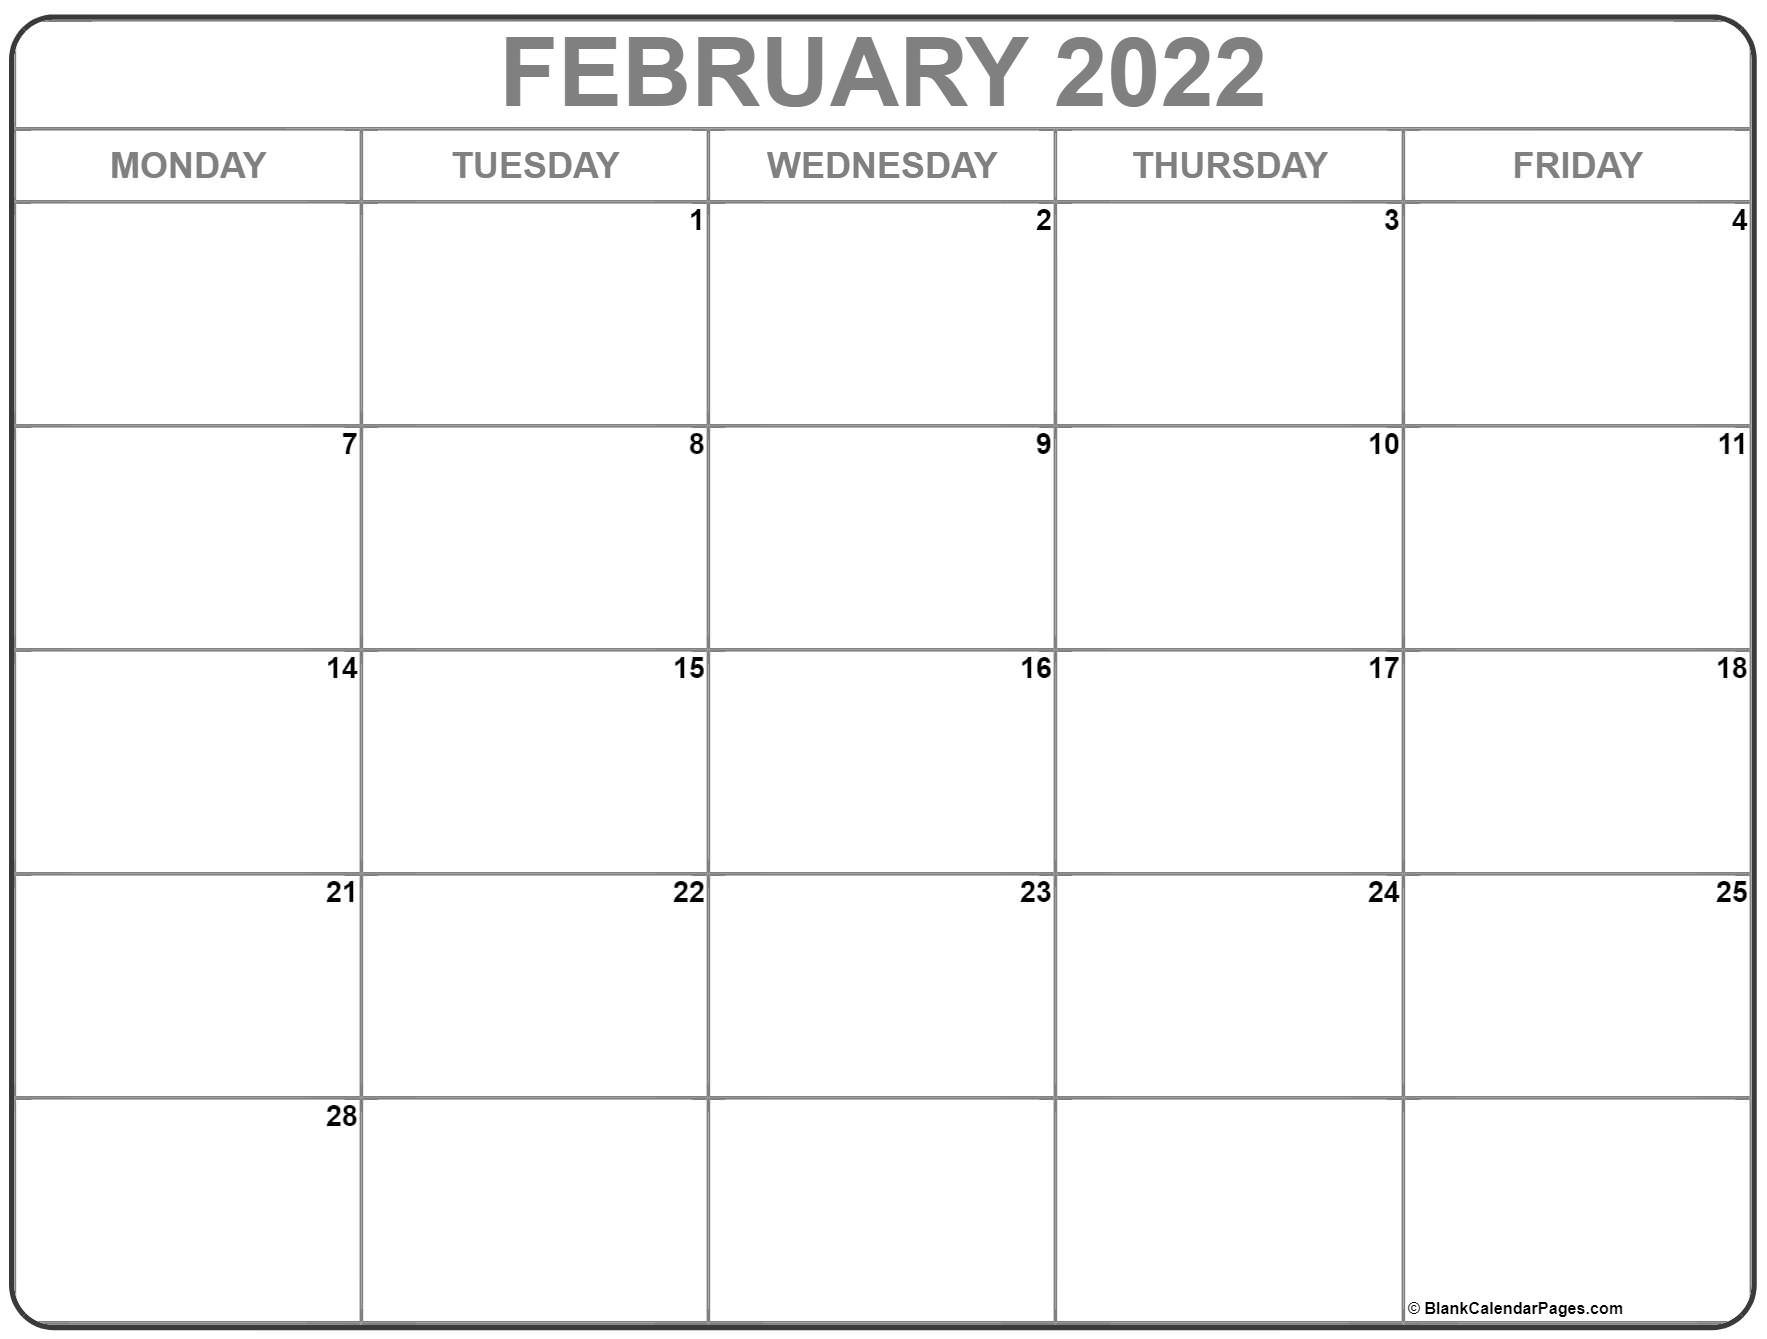 February 2022 Monday Calendar   Monday To Sunday Monday Through Friday Printable